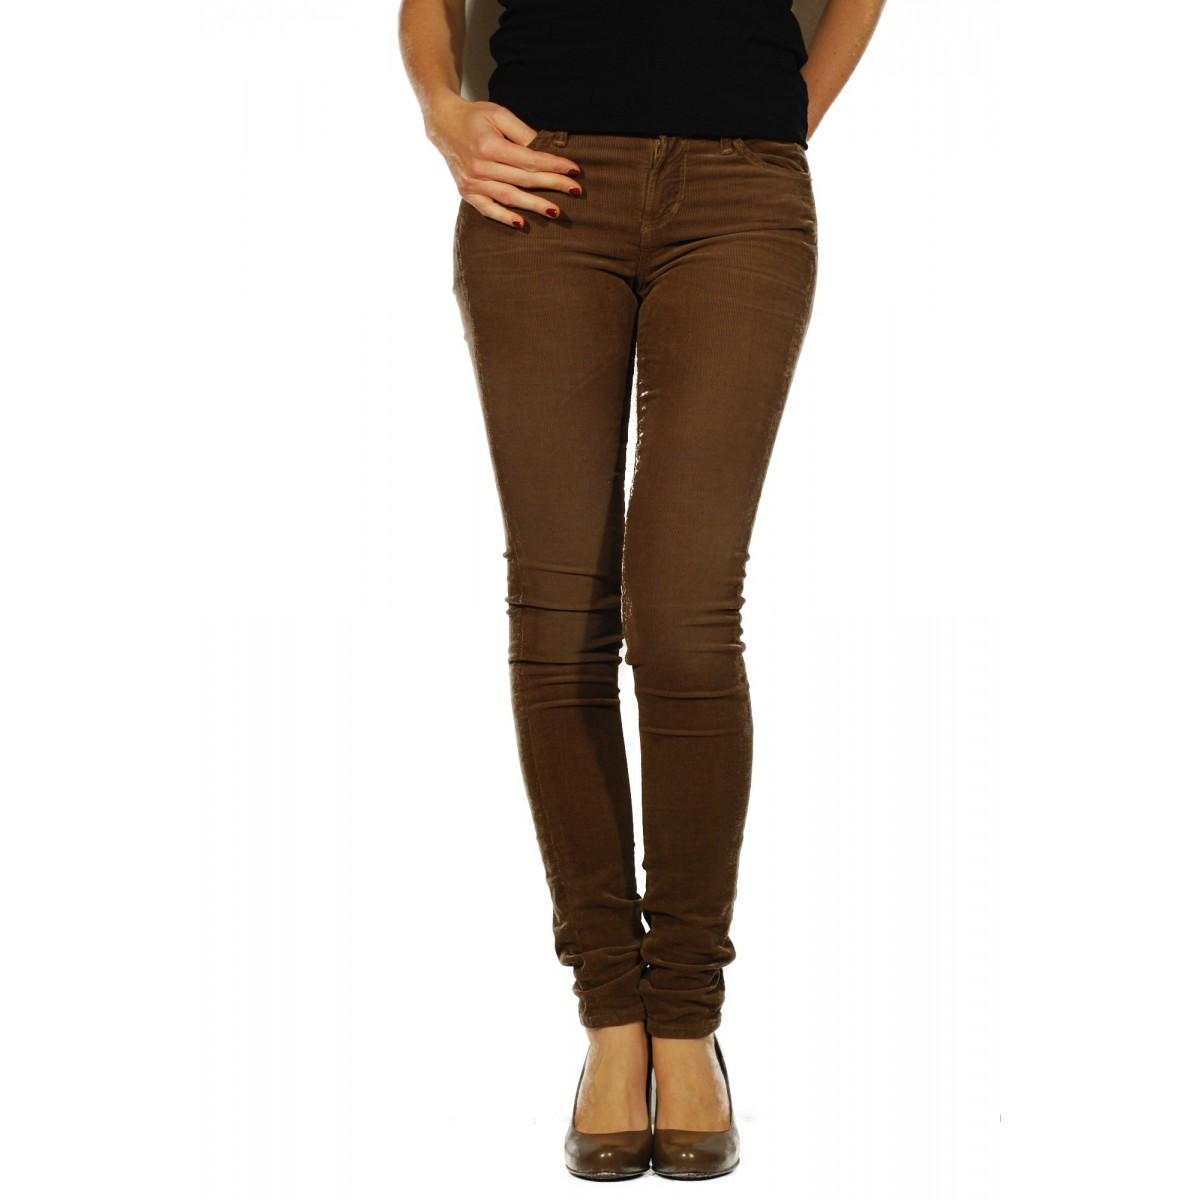 Pantalone Donna Citizens Of Humanity - Avedon Fnnl 13008-041 Velluto Pantalone Donna Vellut0